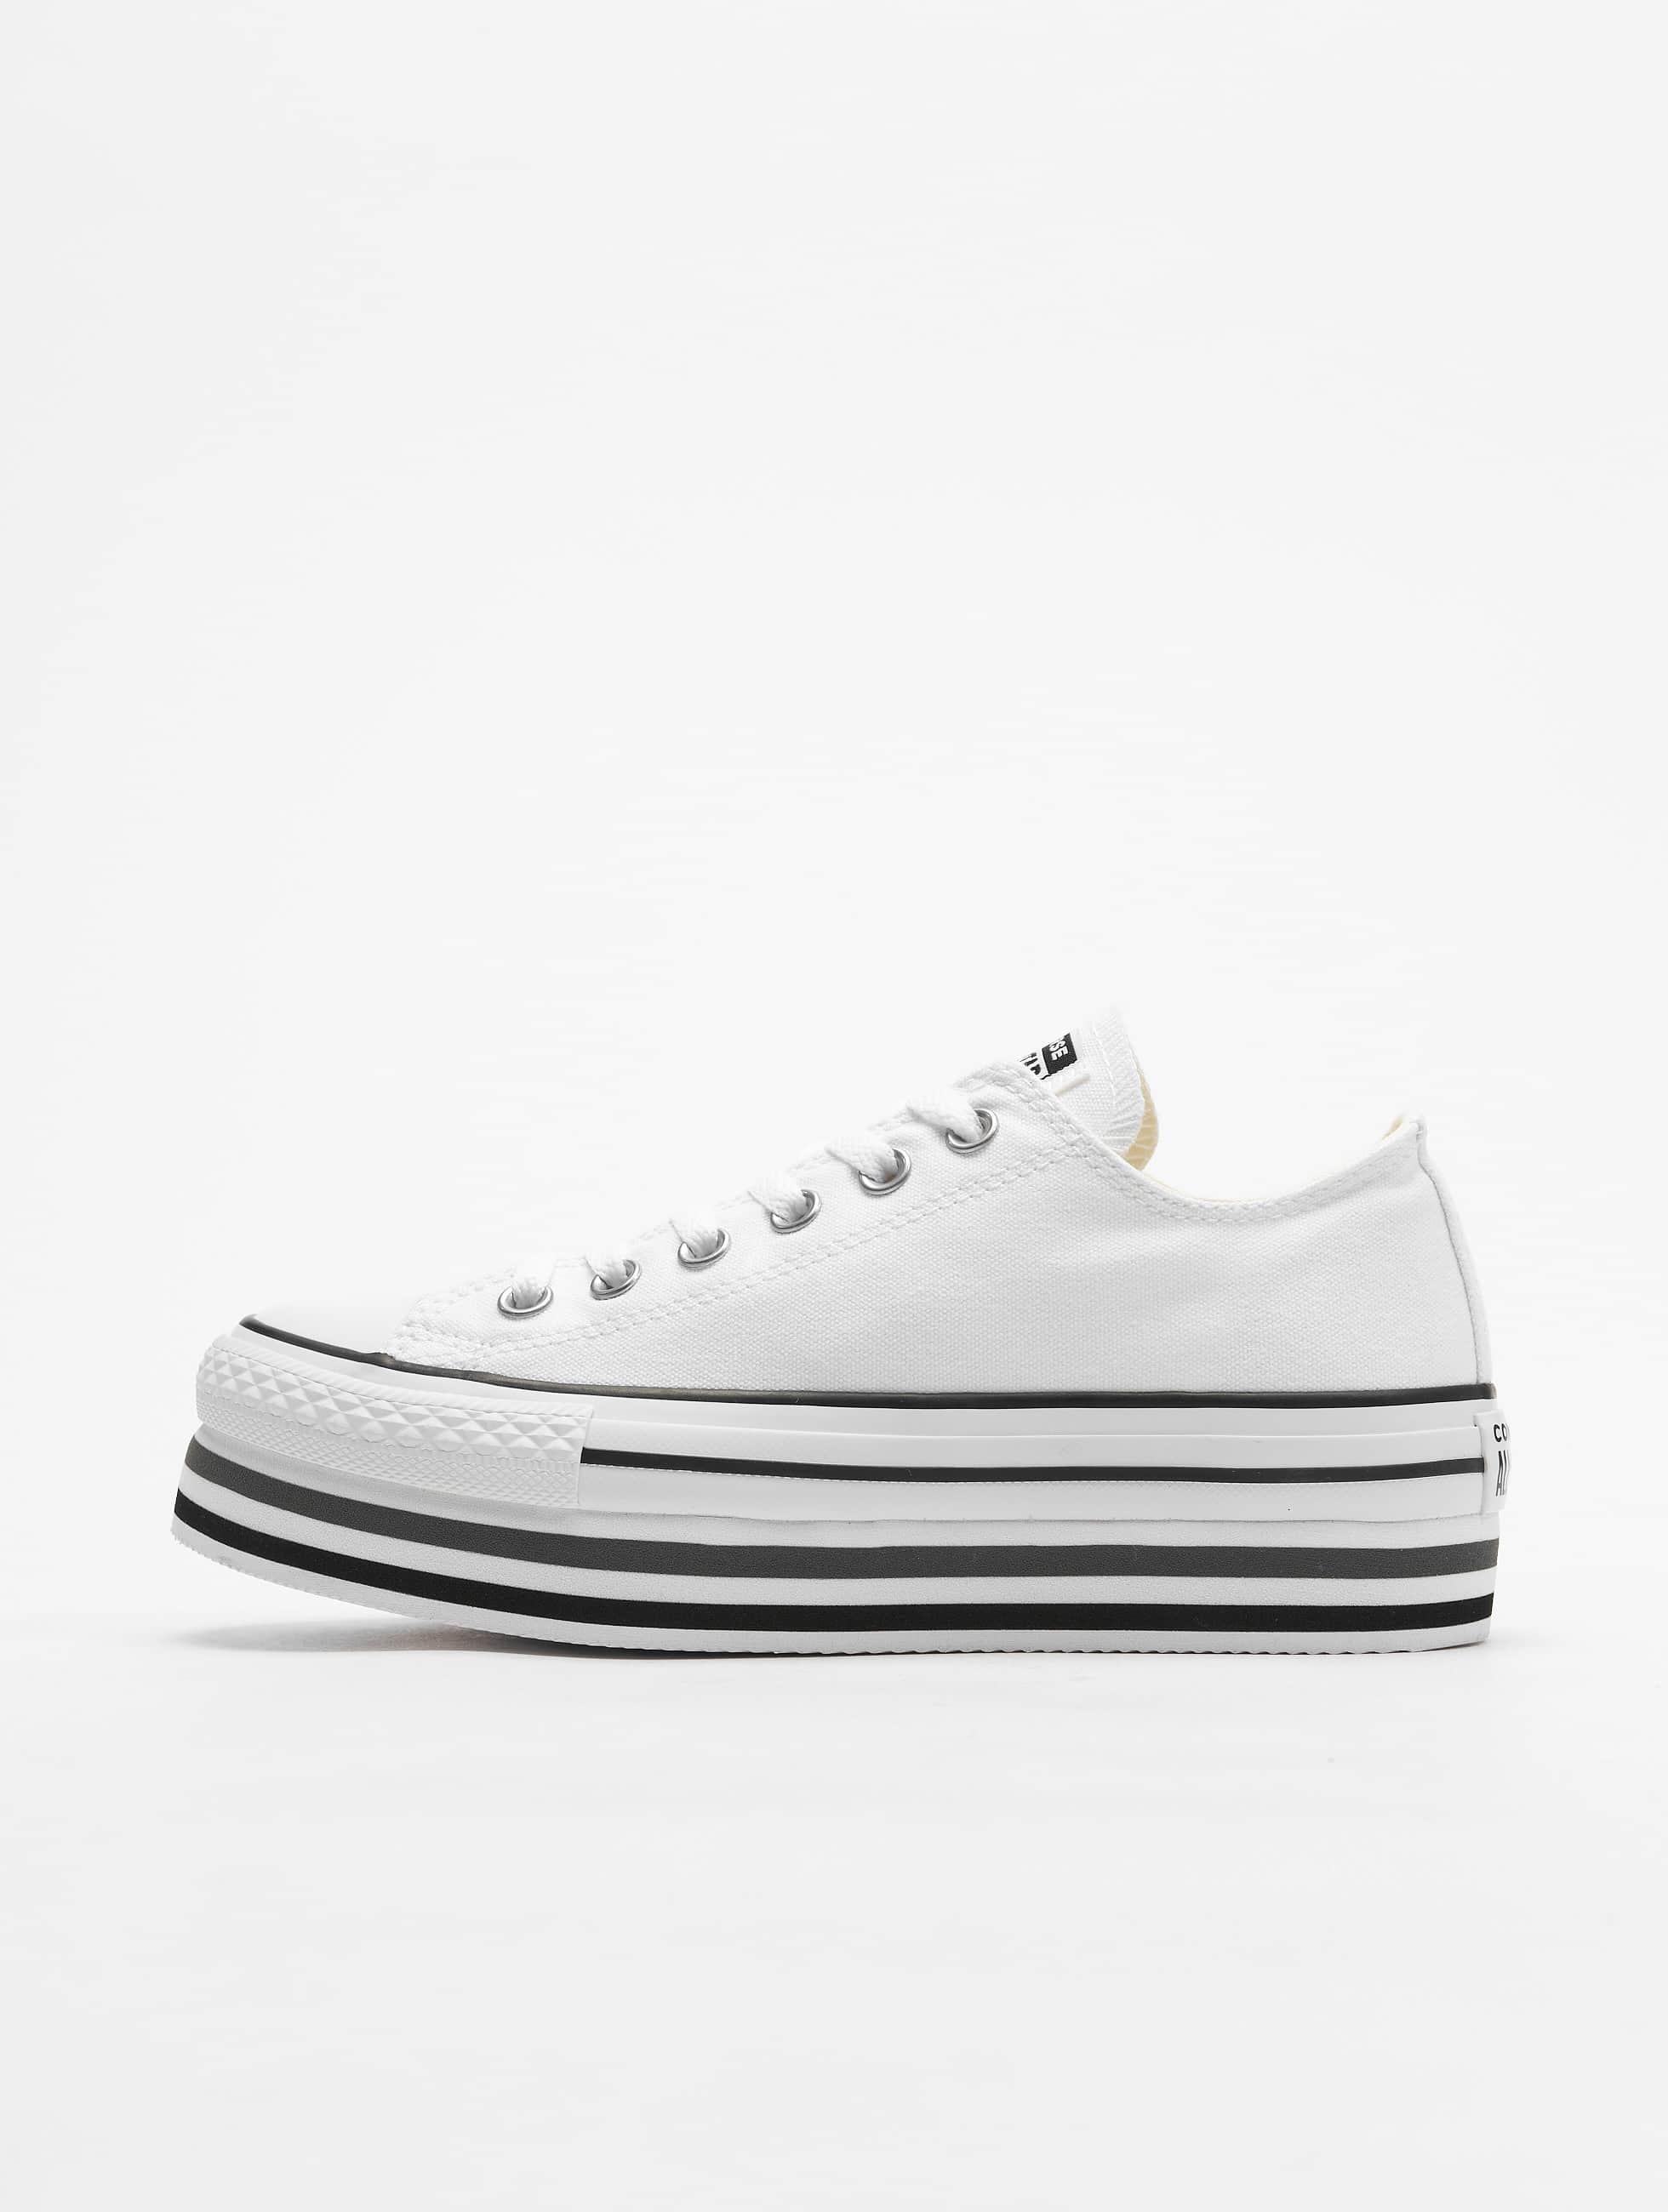 Converse Chuck Taylor All Star Platform Layer Ox Sneakers WhiteBlackThunder